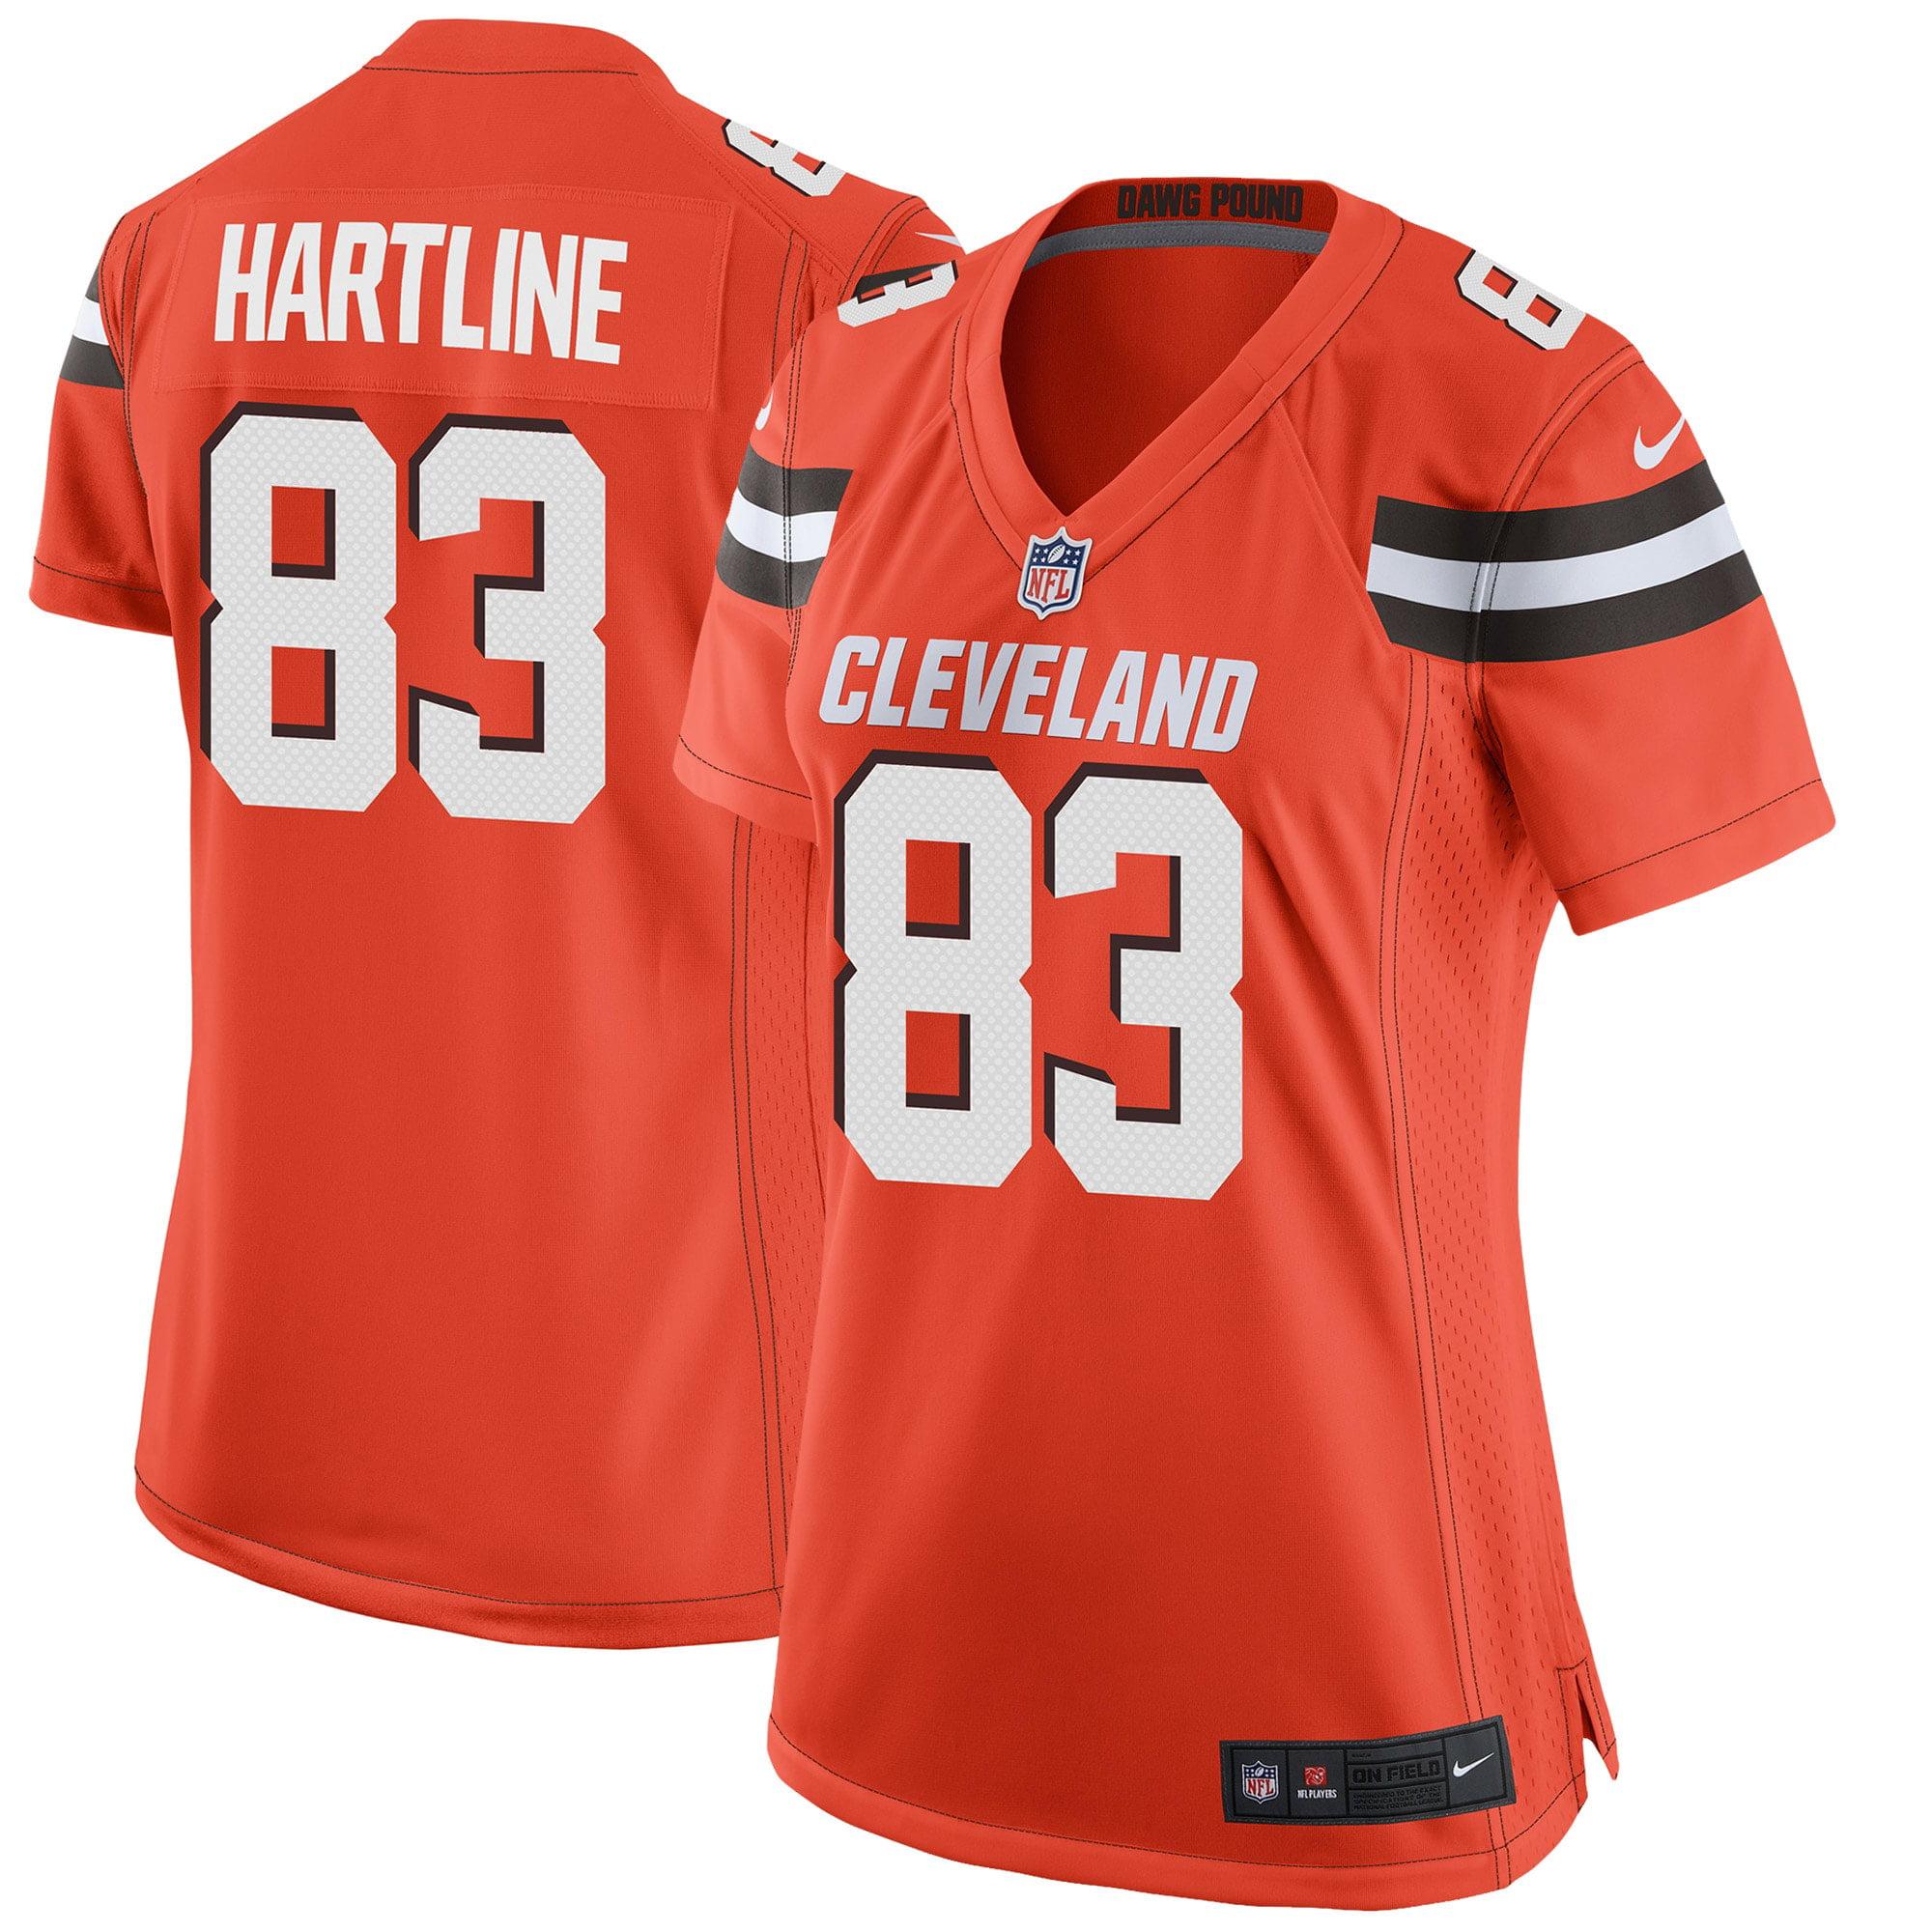 Brian Hartline Cleveland Browns Nike Women's Game Jersey - Orange - Walmart.com